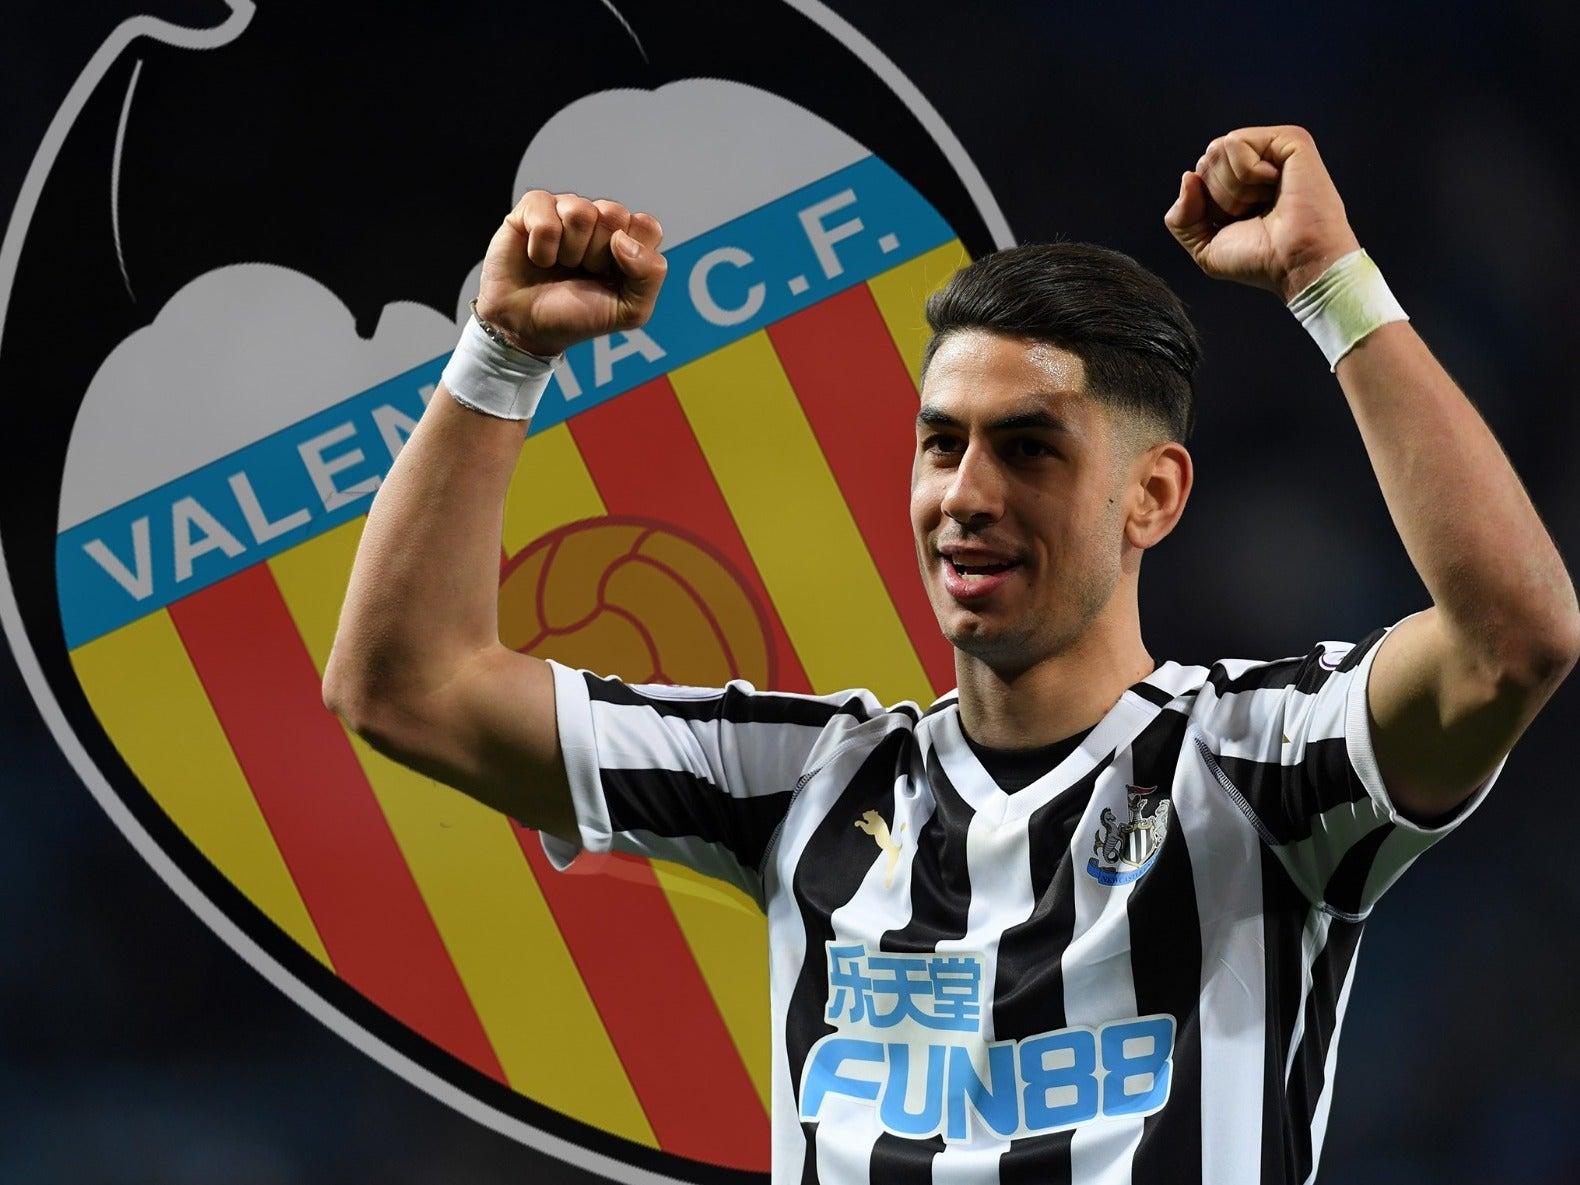 Newcastle transfer news: Ayoze Perez eyeing Valencia move after Rafa Benitez departure